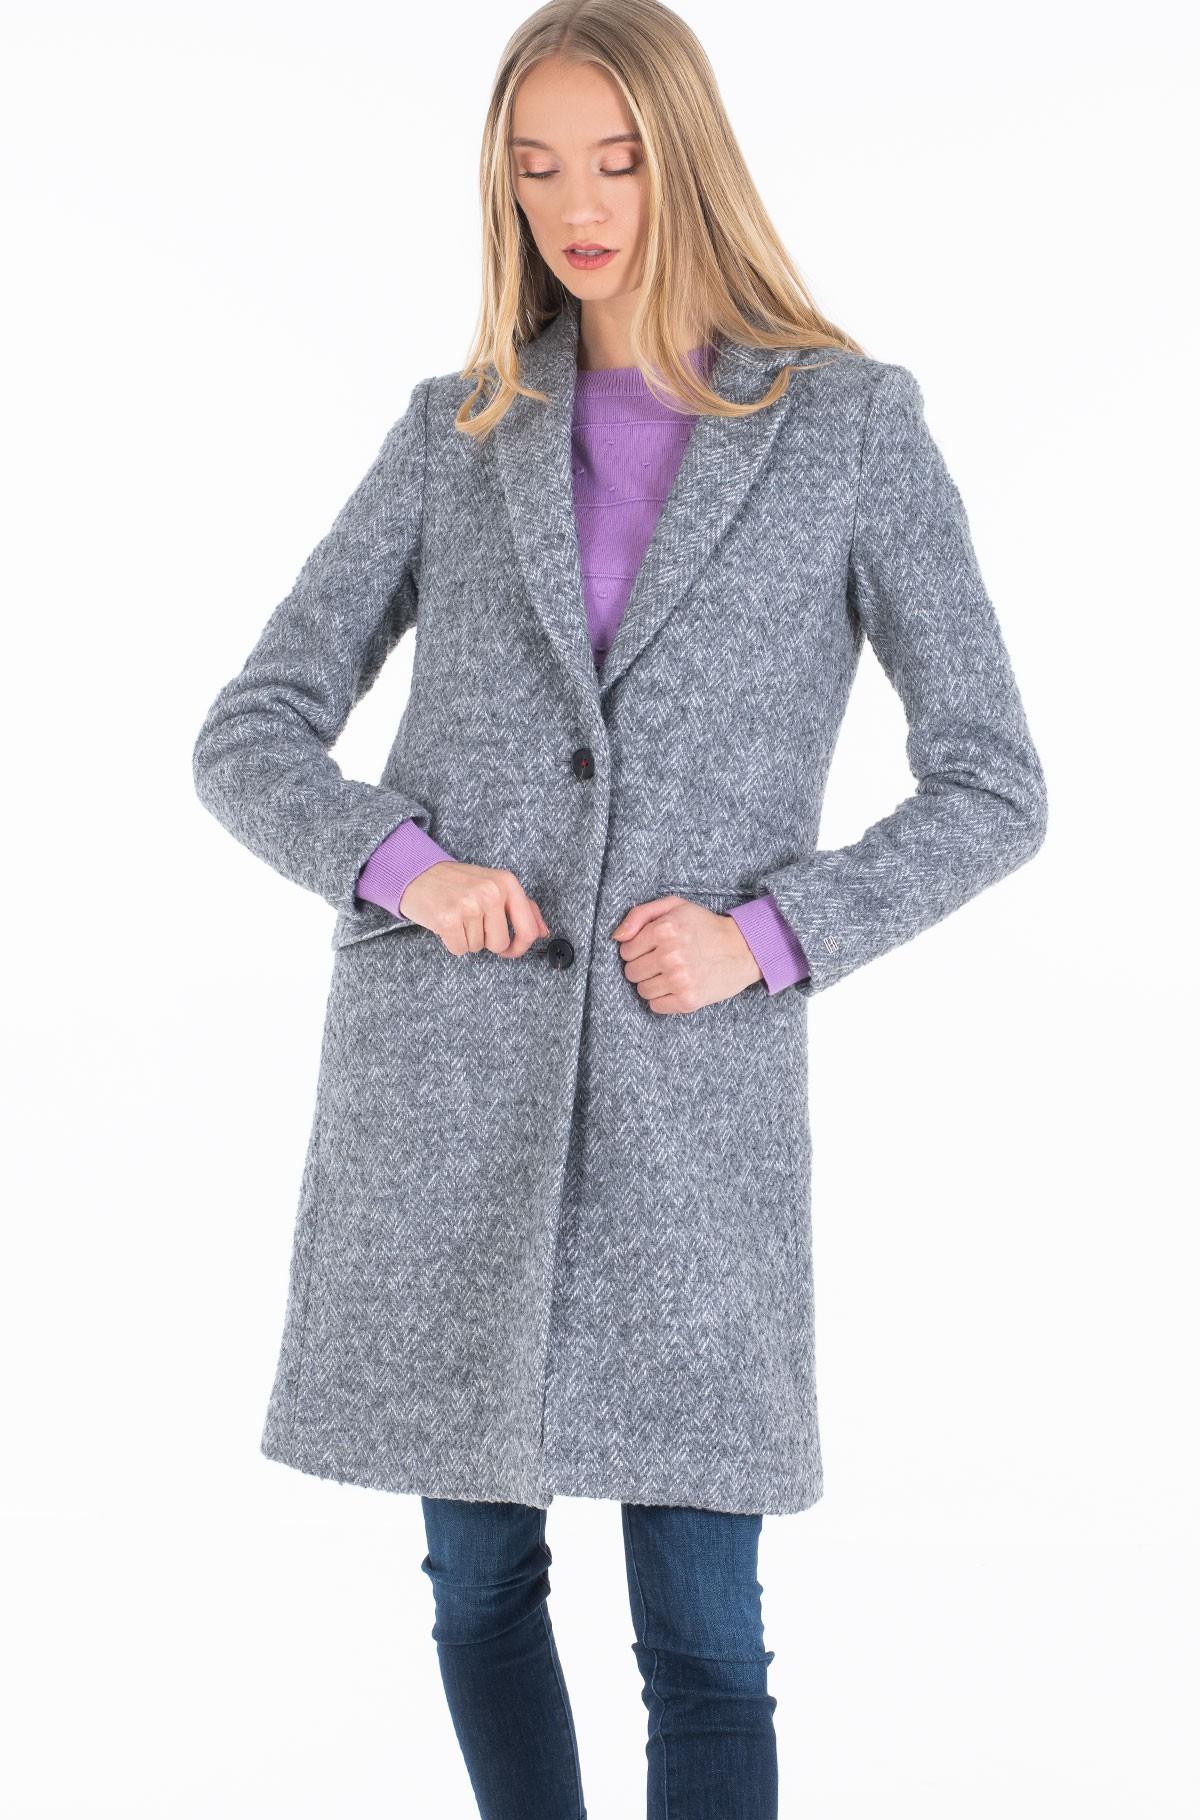 Coat NATASHA TEXTURED CLASSIC COAT-full-1